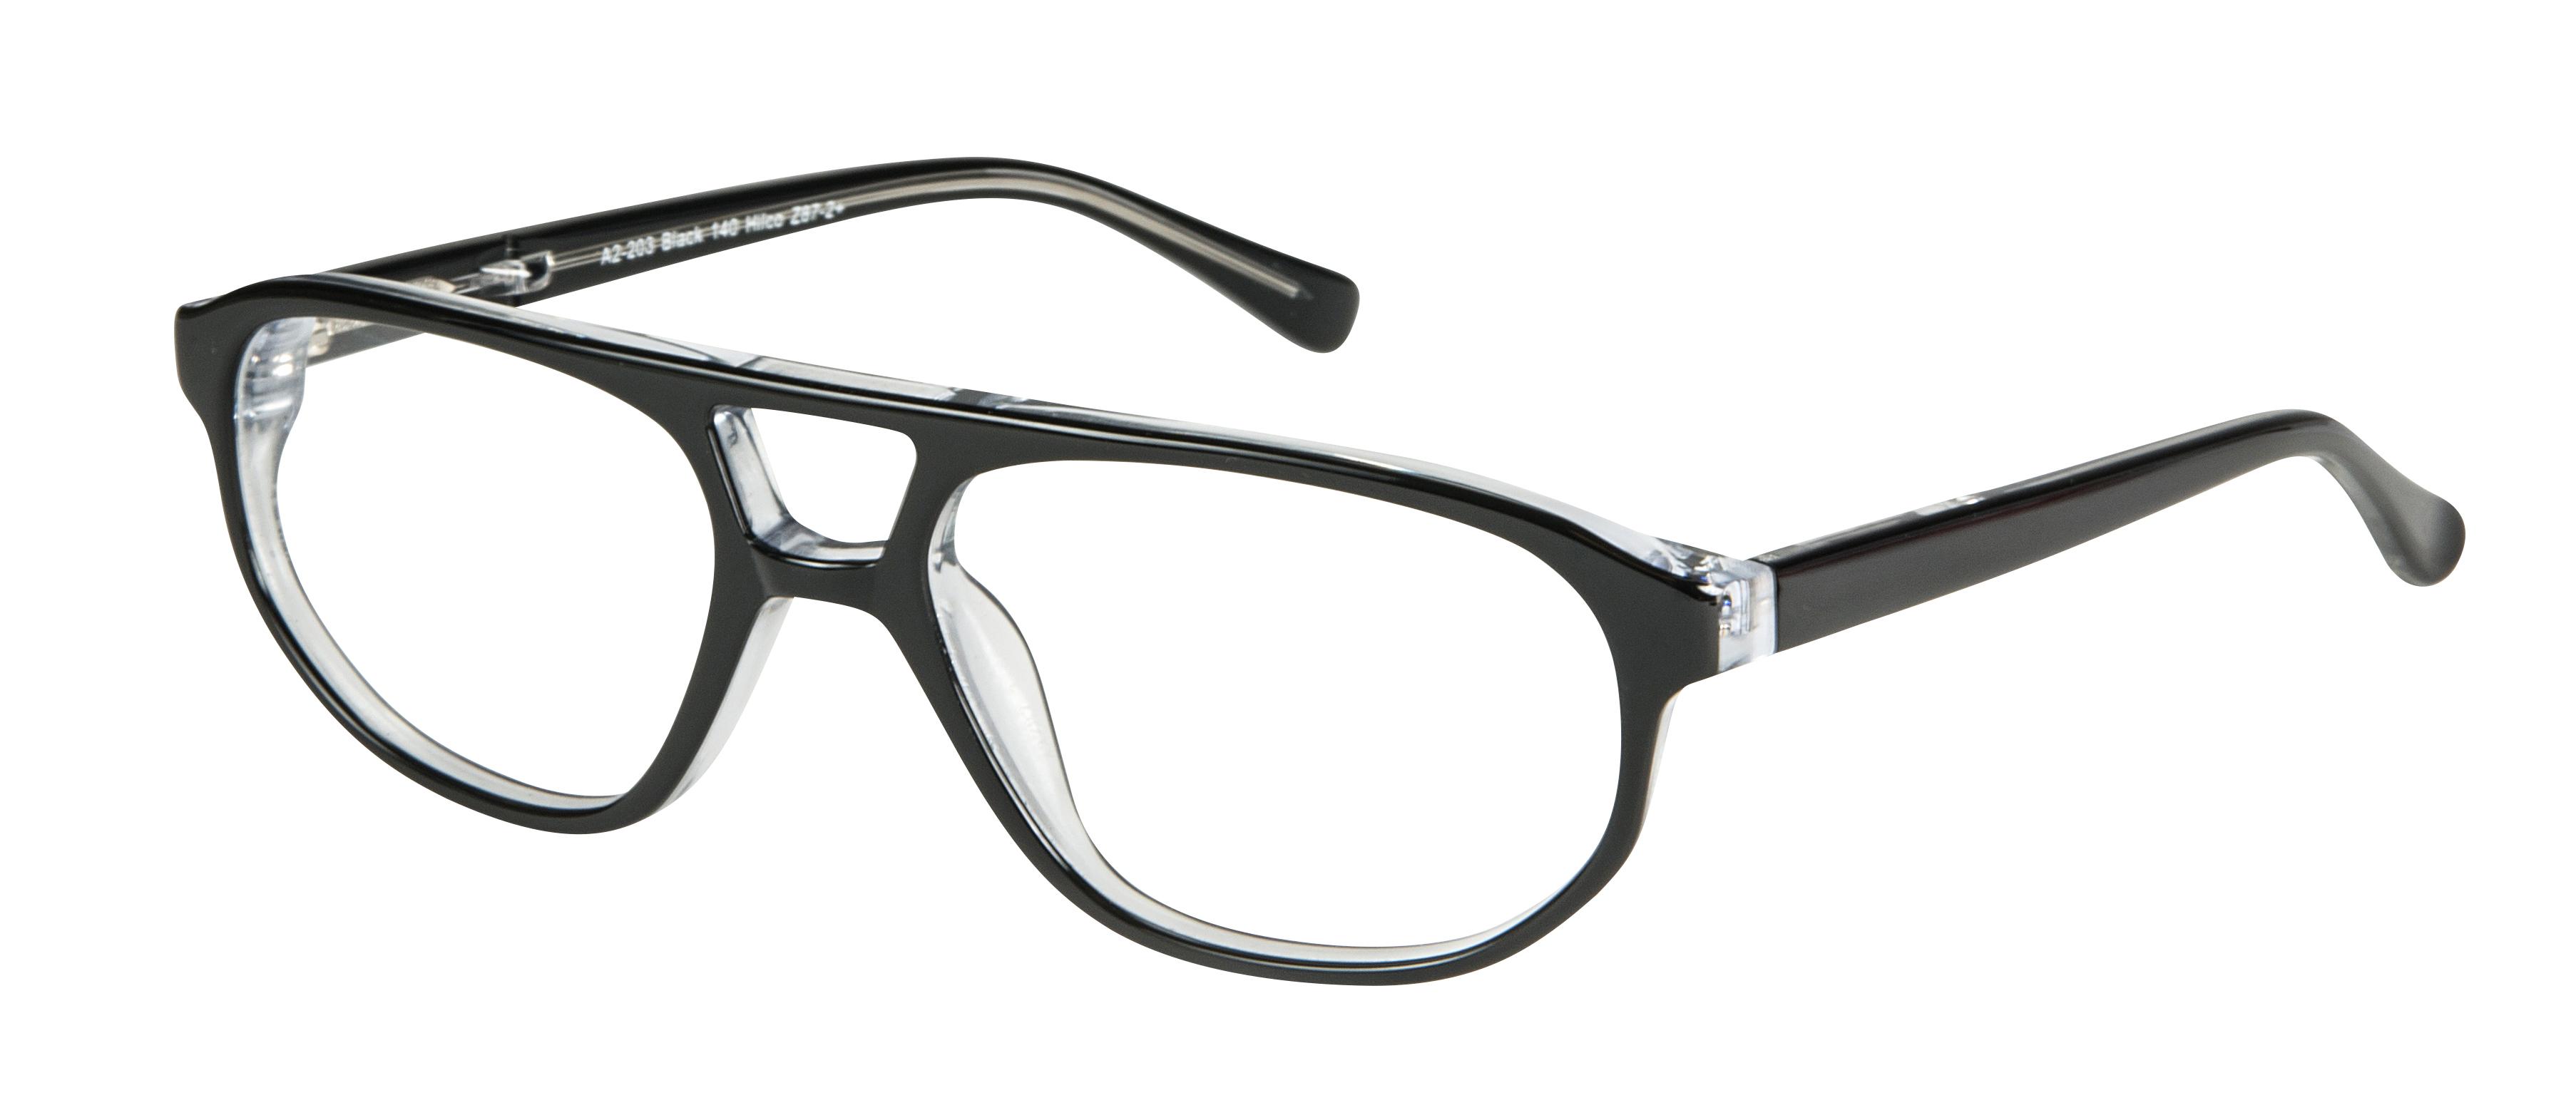 Safety Eyewear Safety Glasses Network